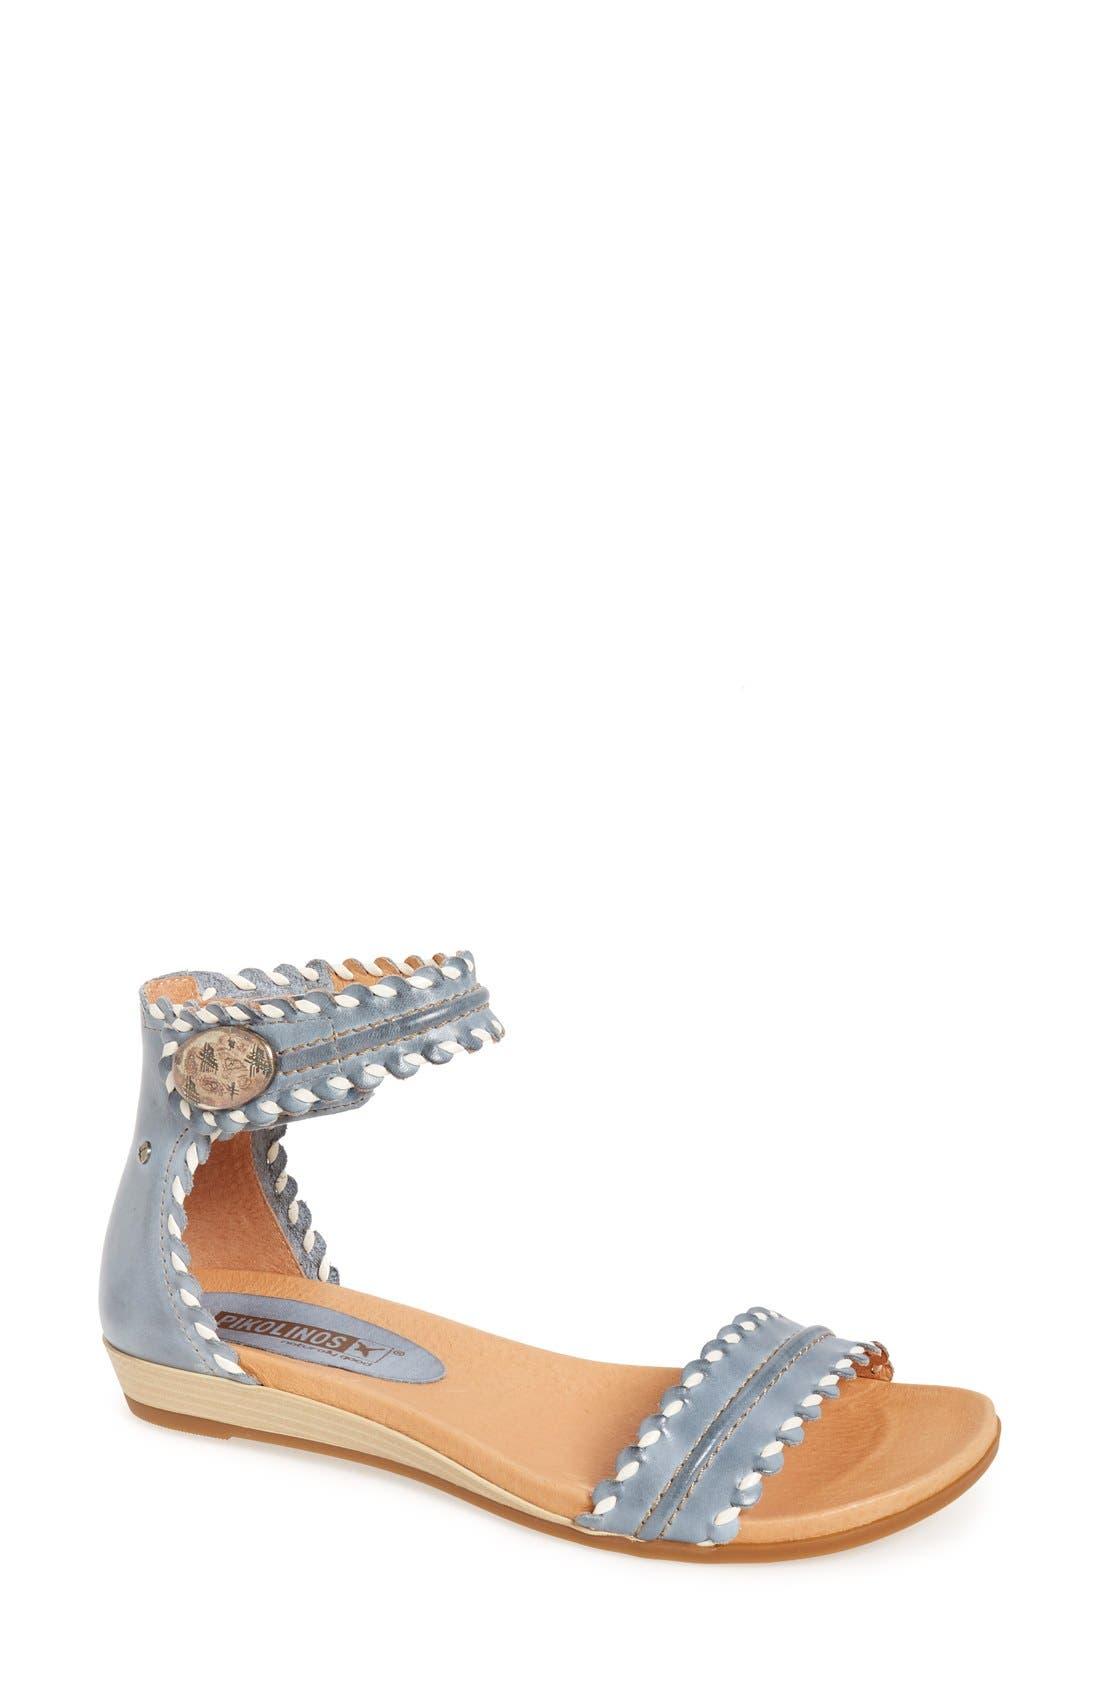 'Alcudia' Ankle Strap Sandal,                         Main,                         color, Denim Leather